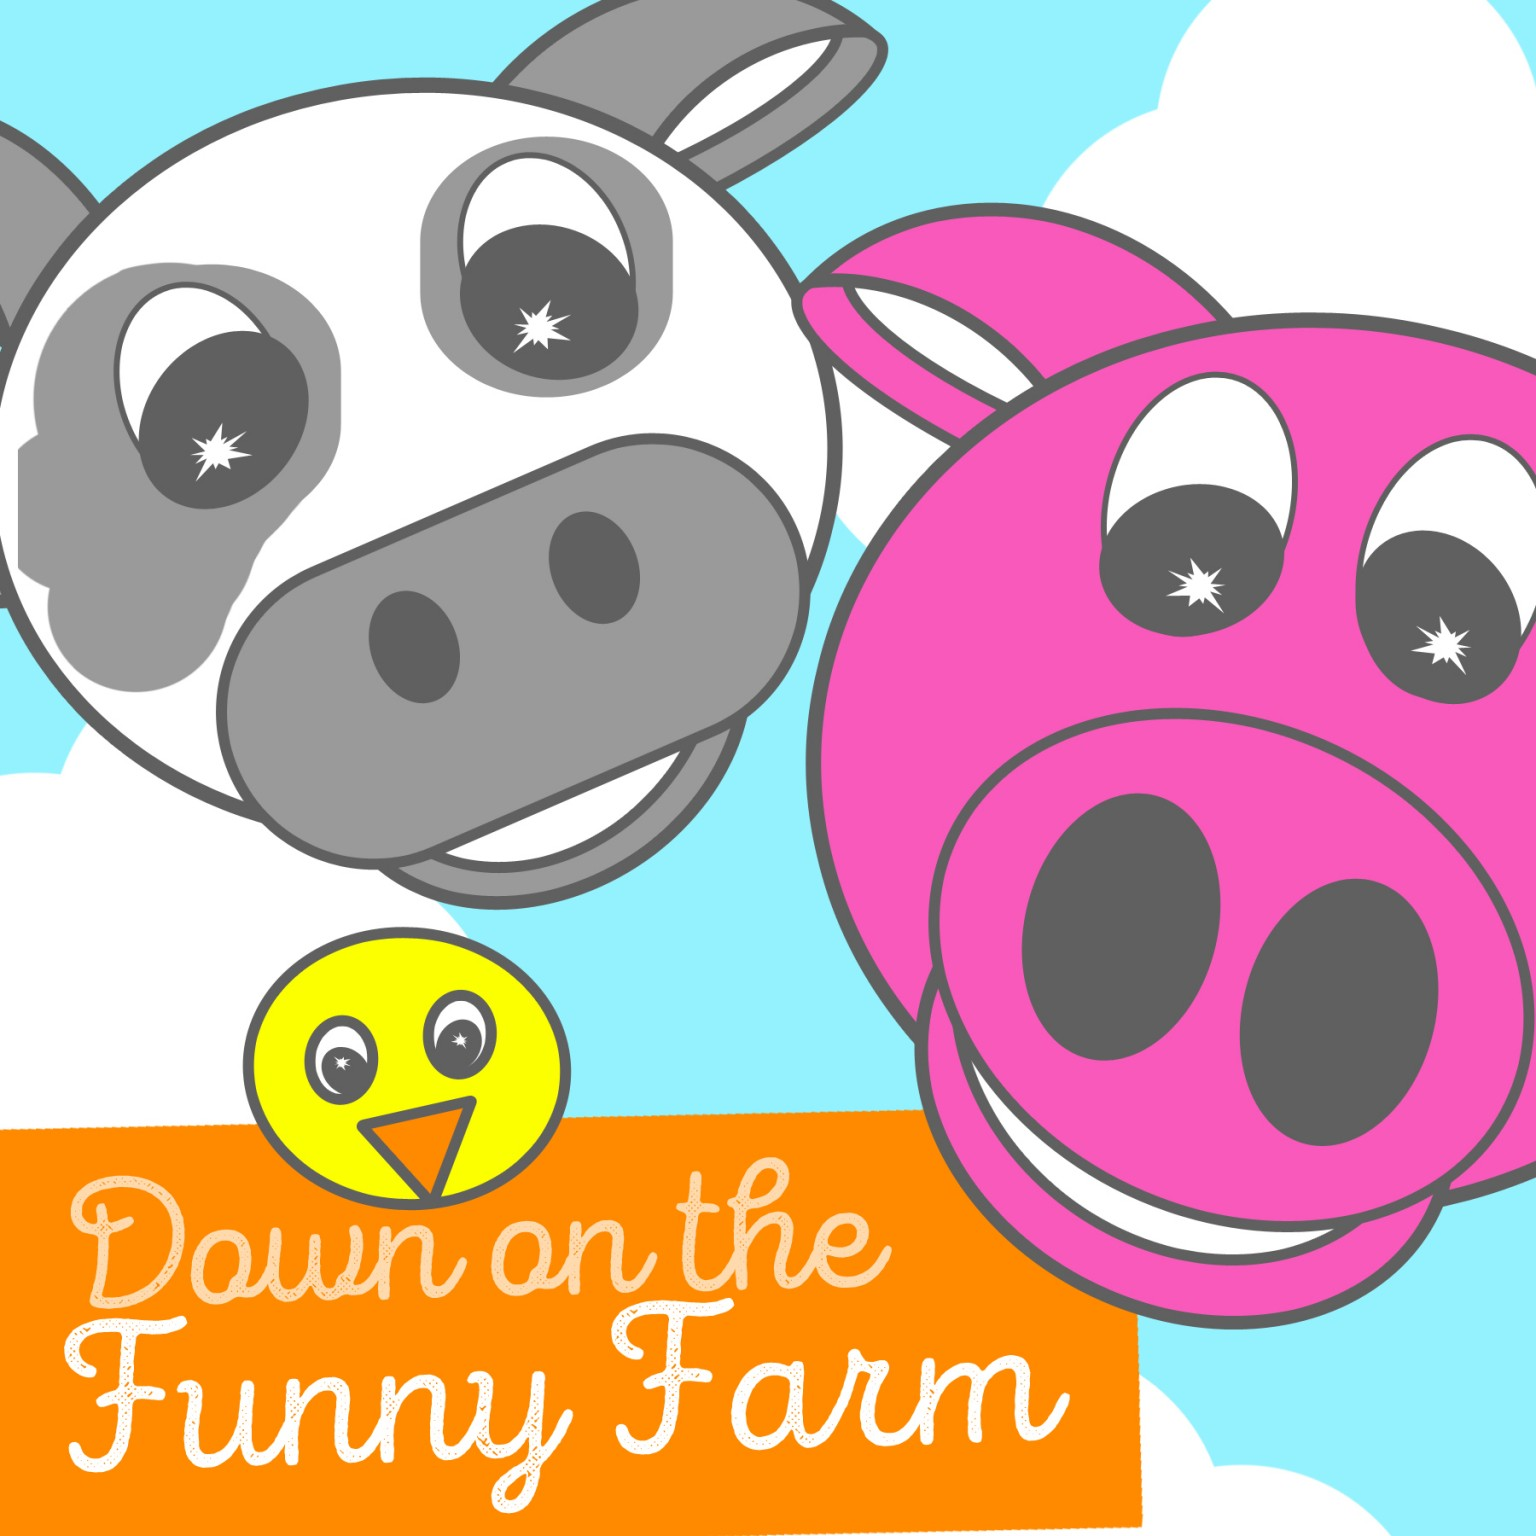 2 Funny Farm